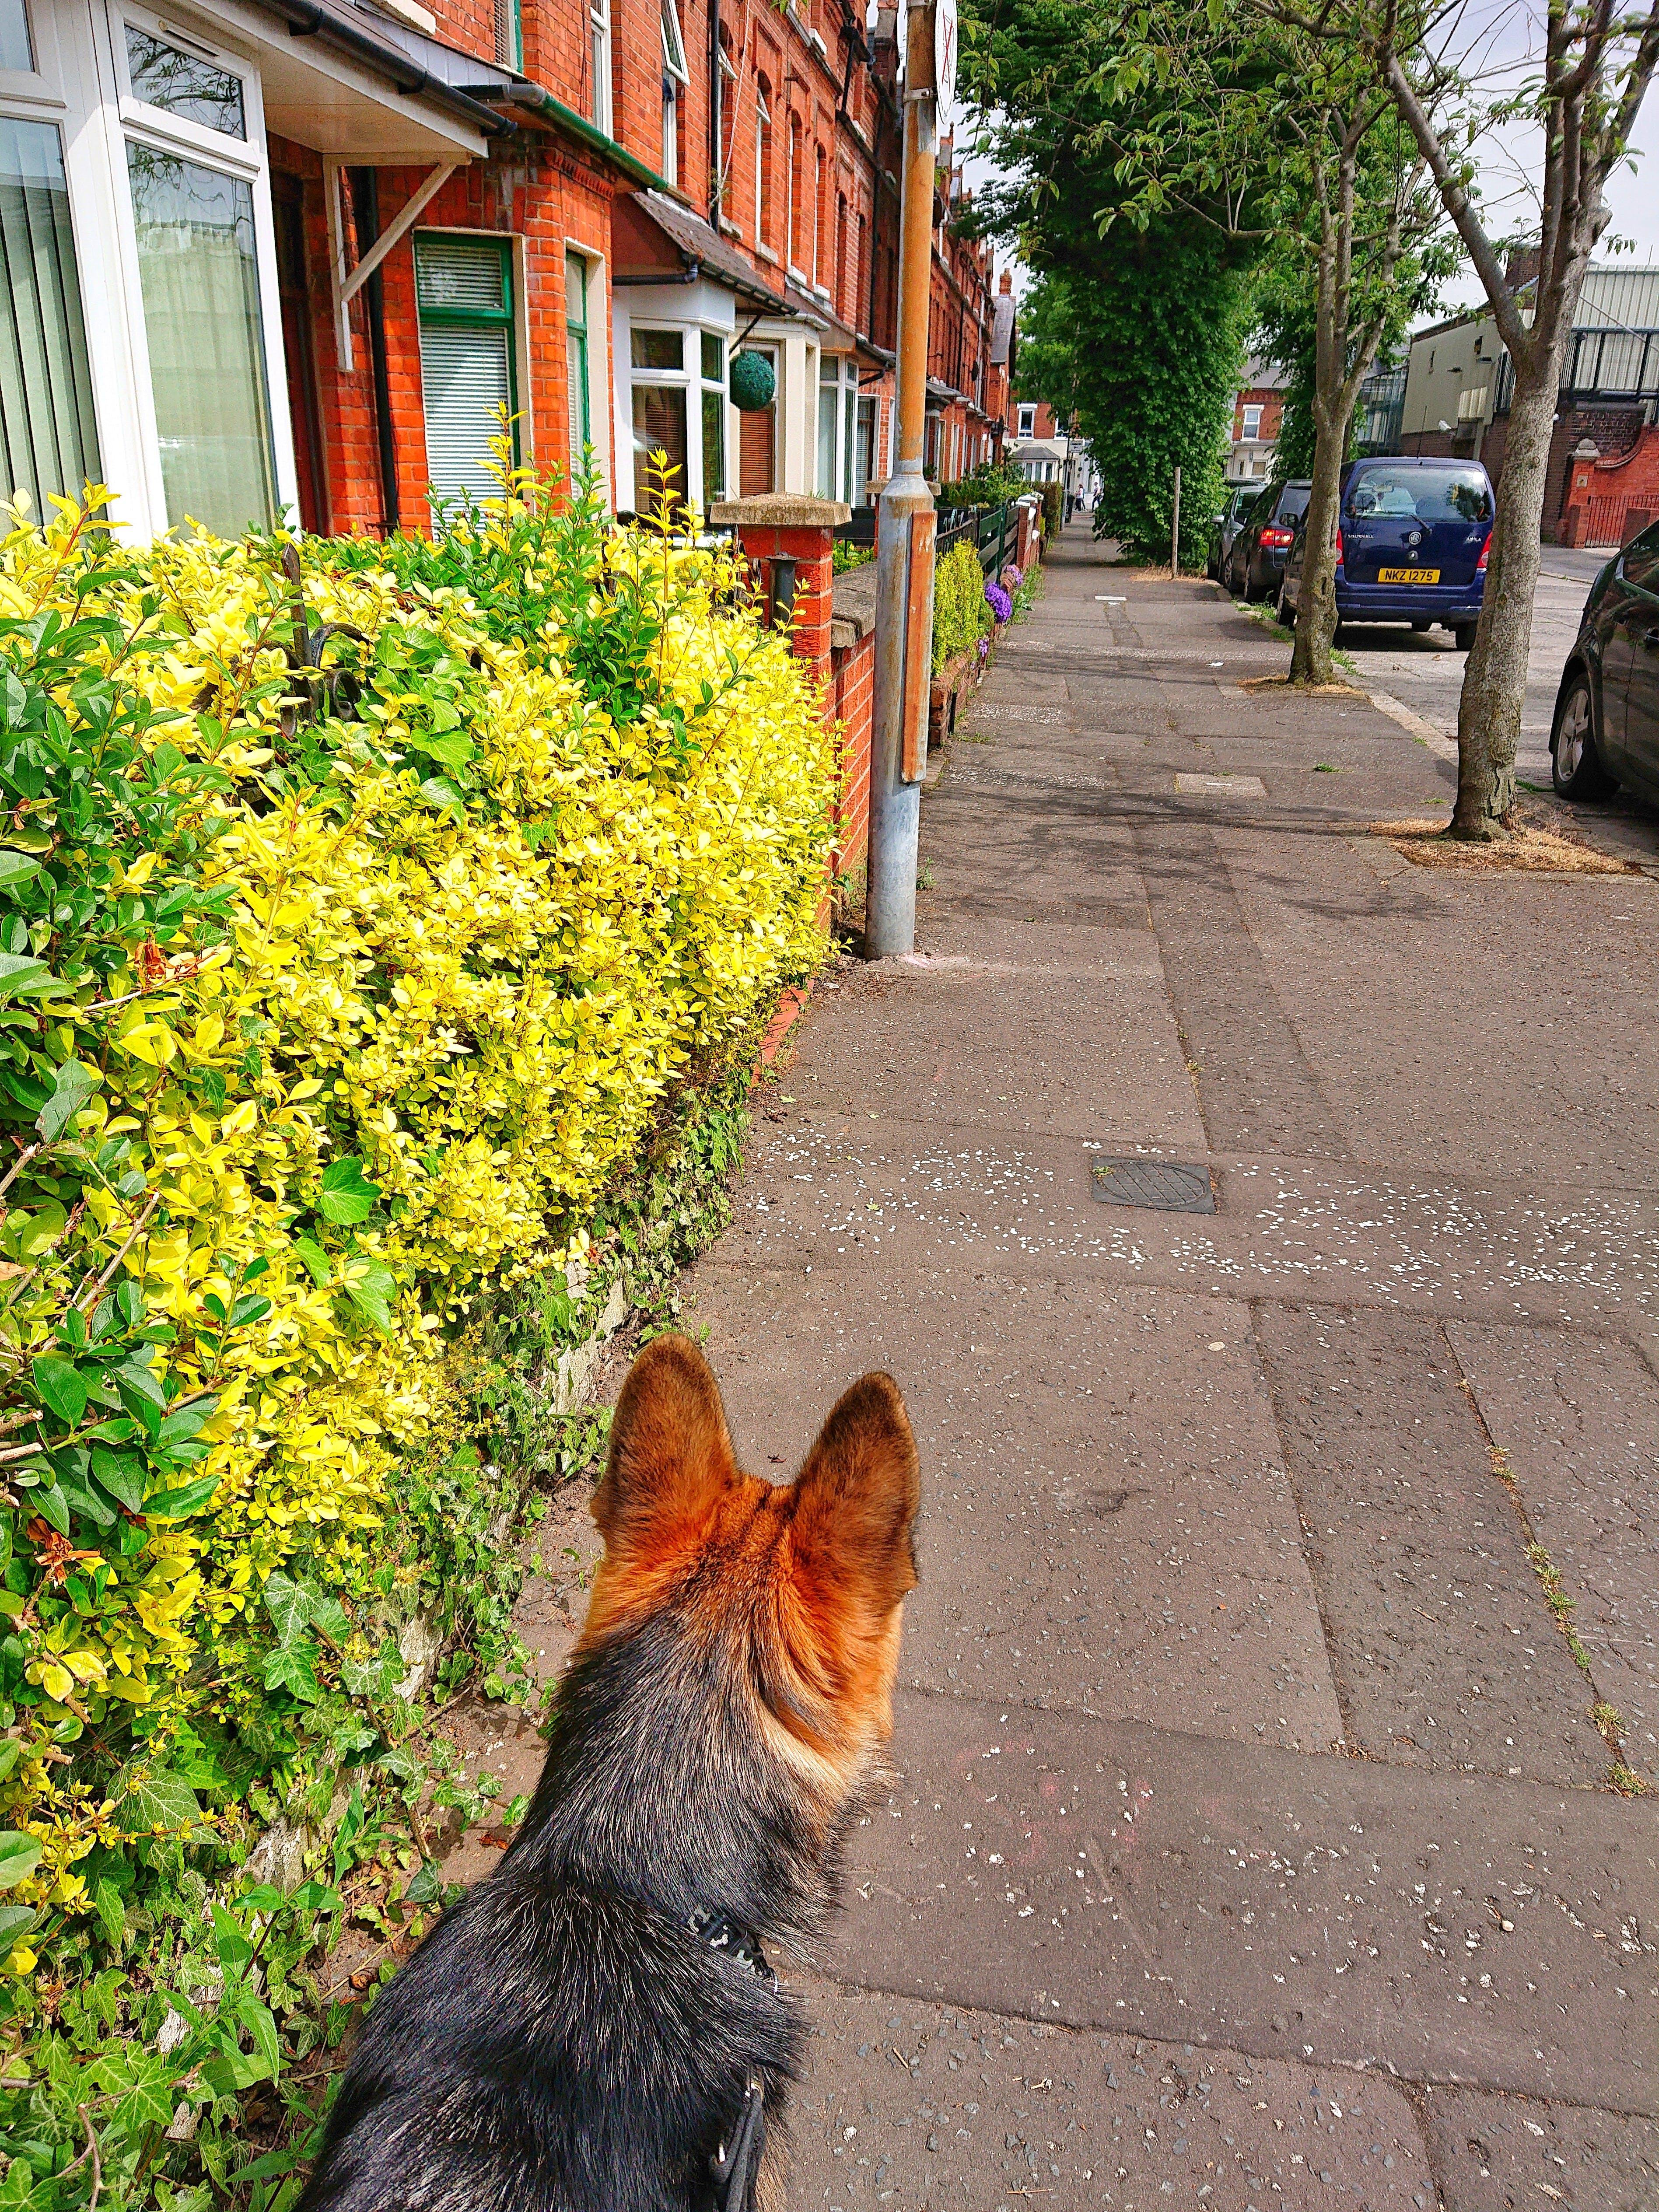 Free stock photo of Belfast, bushes, cars, dog